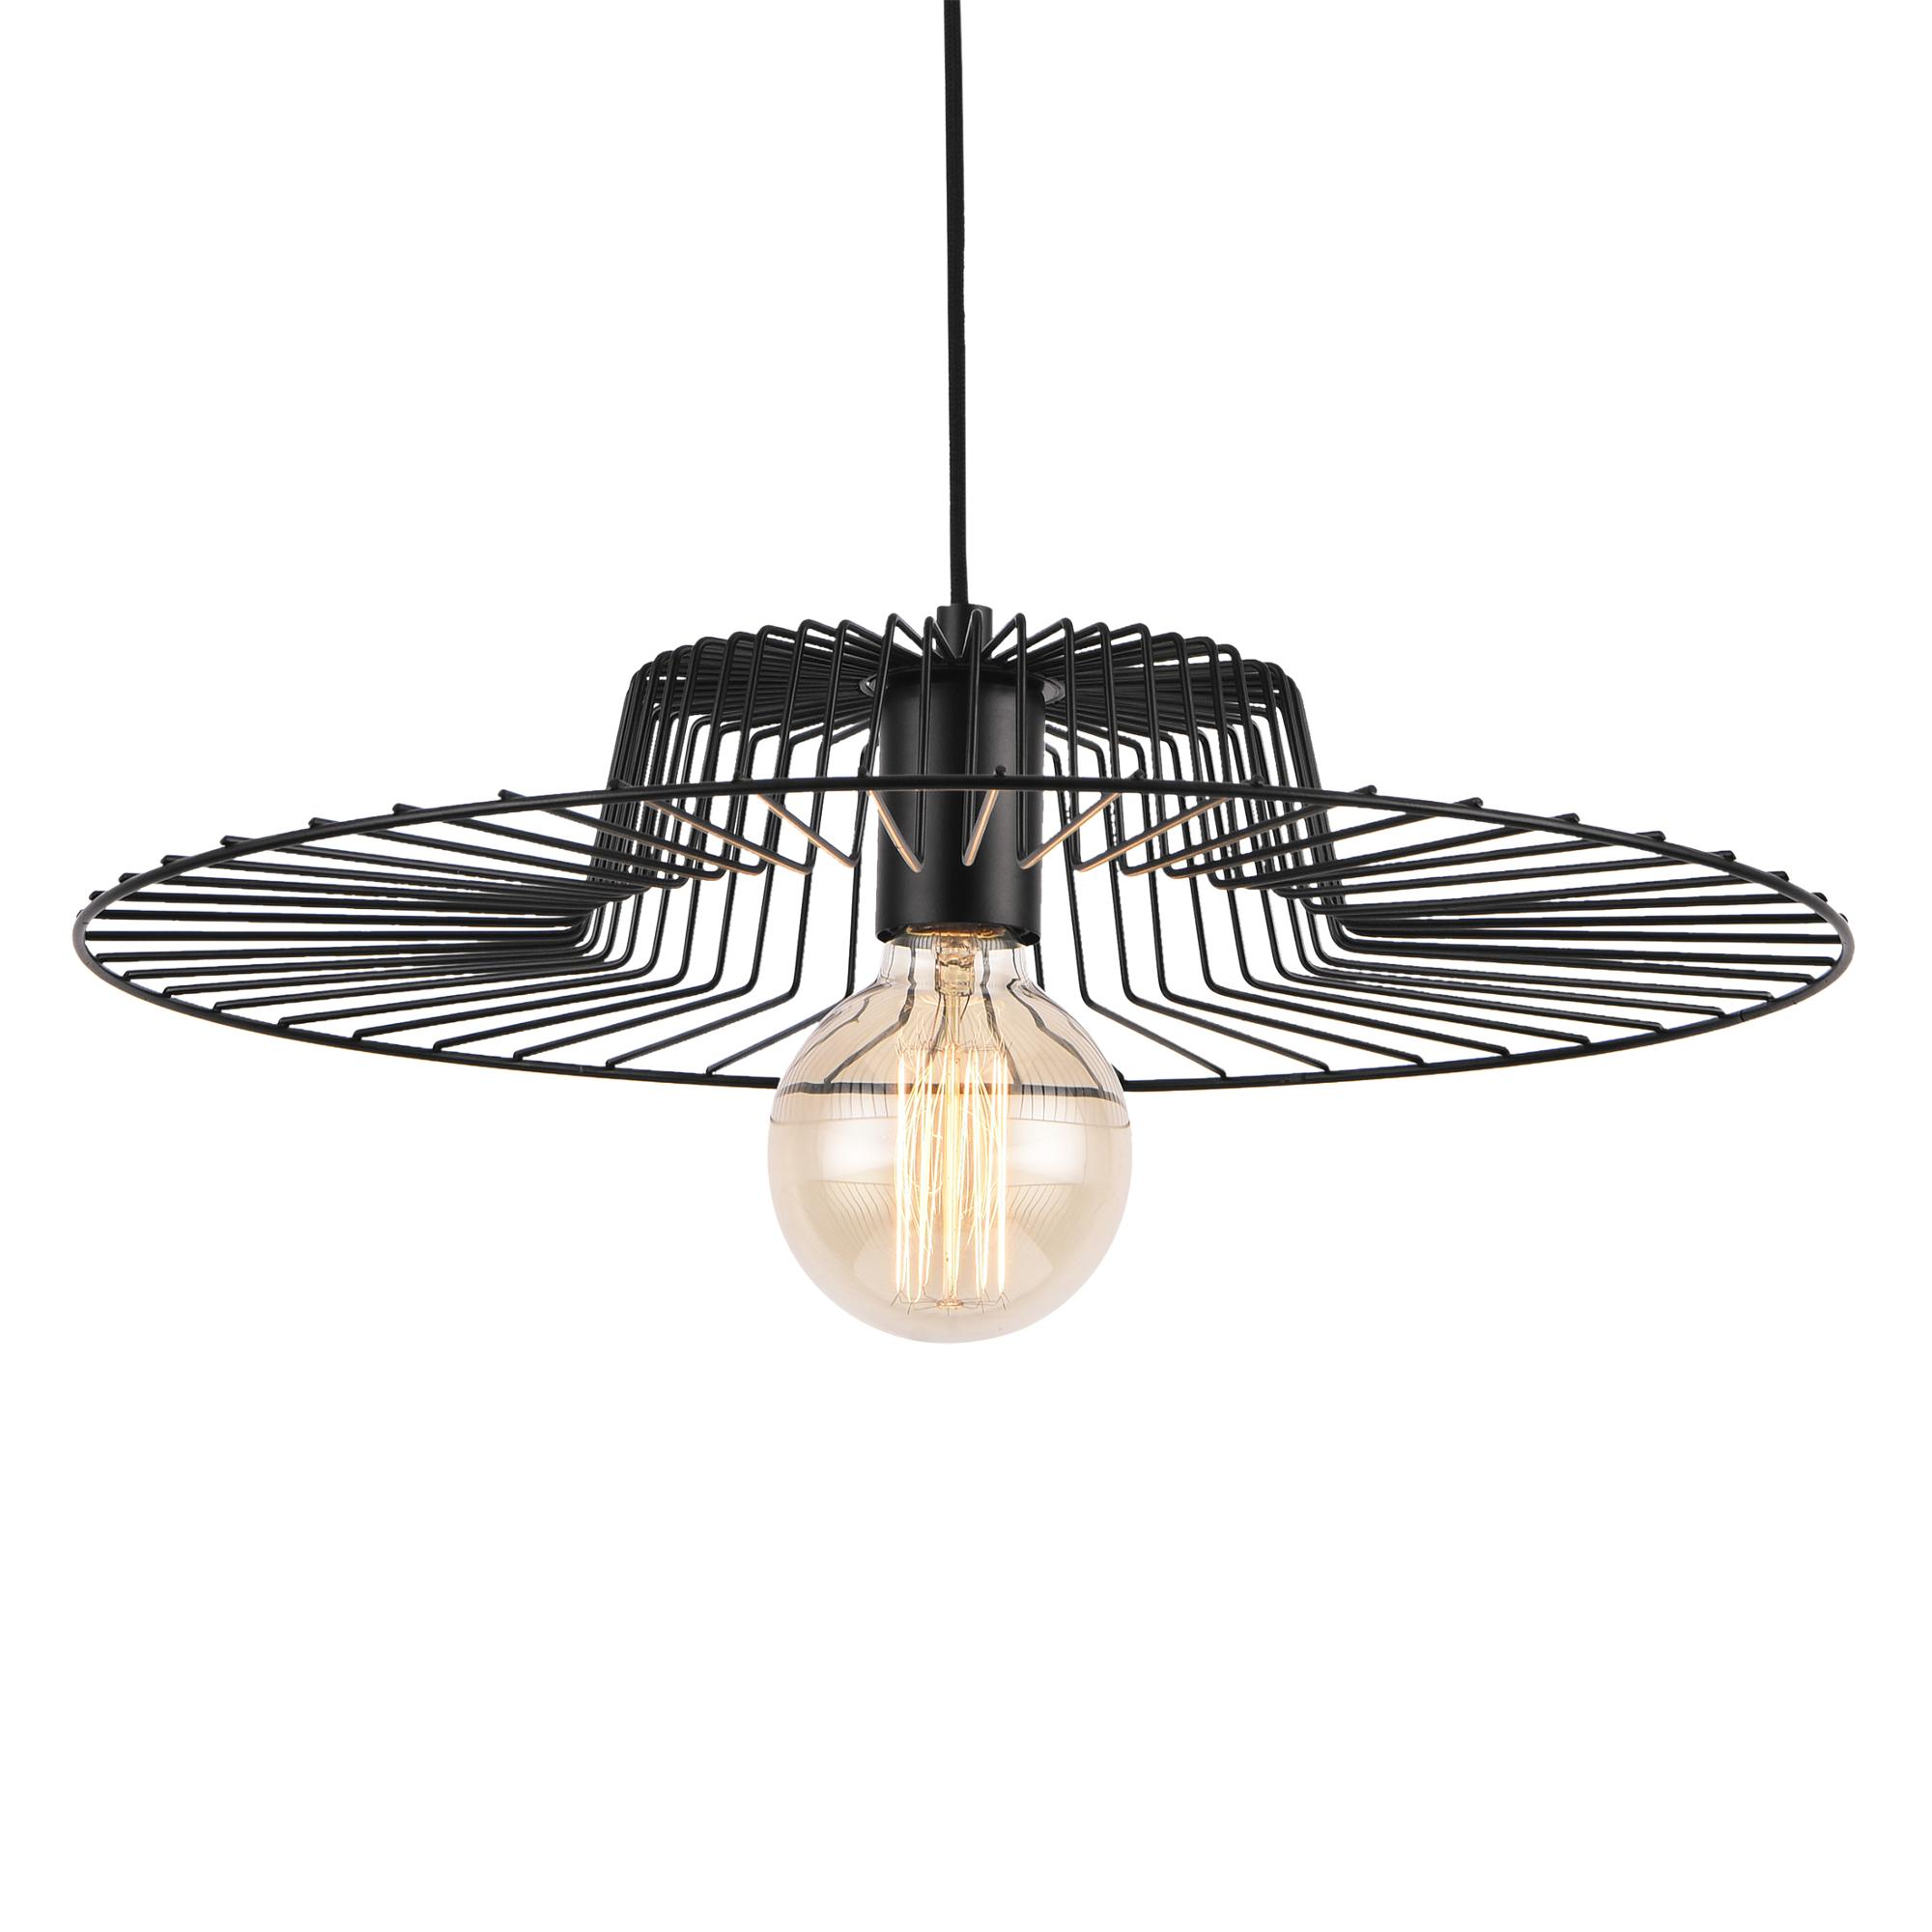 h ngeleuchte metall deckenleuchte leuchte. Black Bedroom Furniture Sets. Home Design Ideas